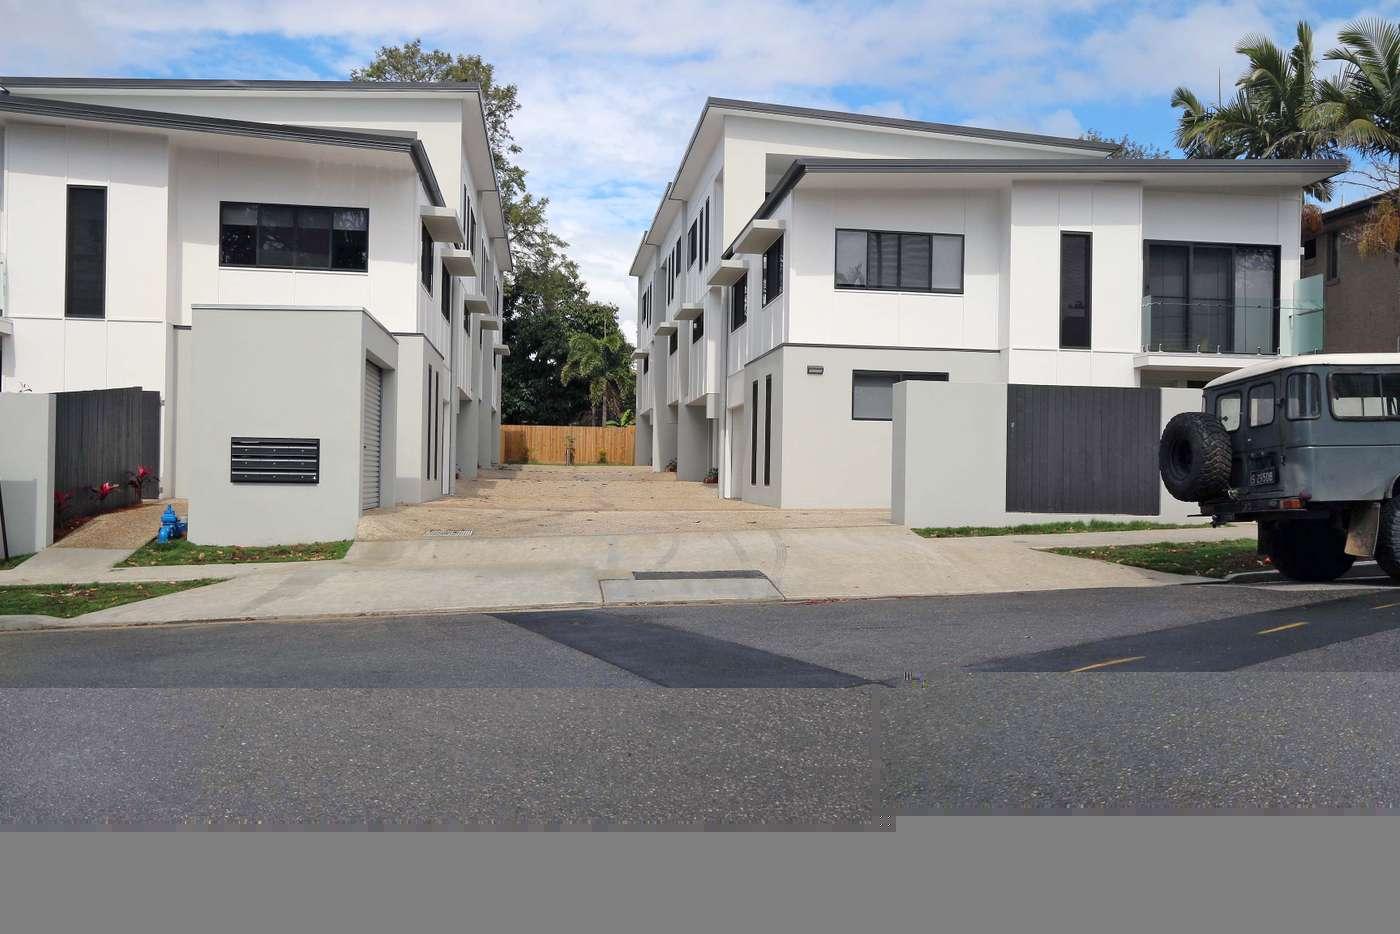 Main view of Homely townhouse listing, 22 Creighton Street, Mount Gravatt QLD 4122